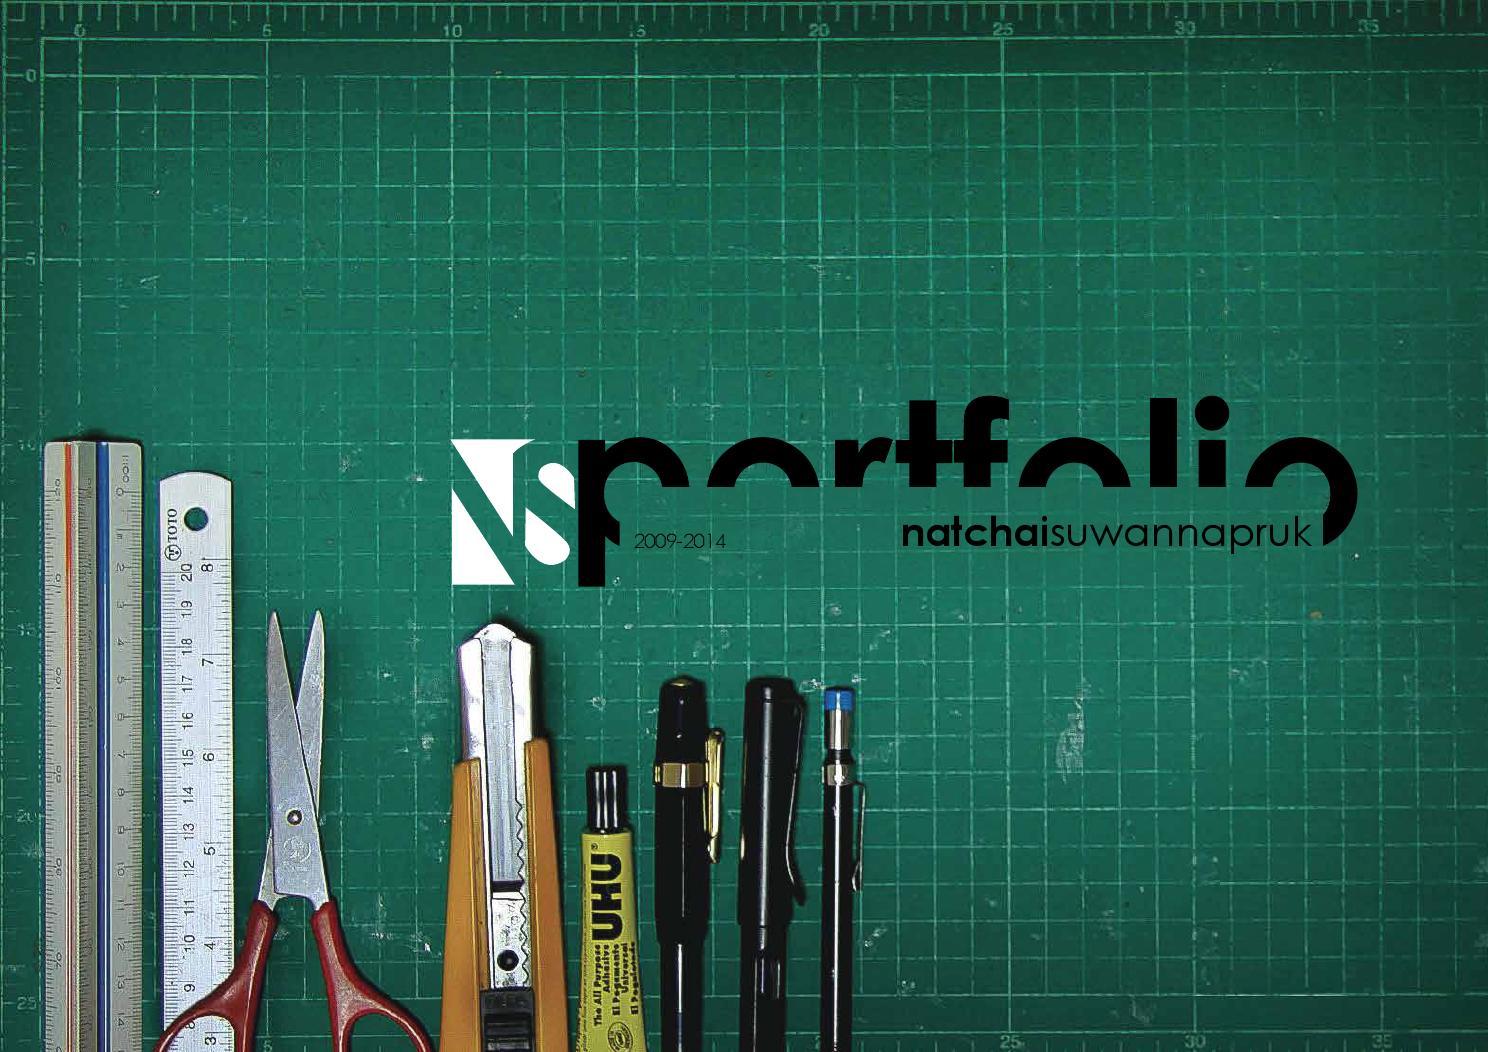 an architectural portfolio by natchai suwannapruk by